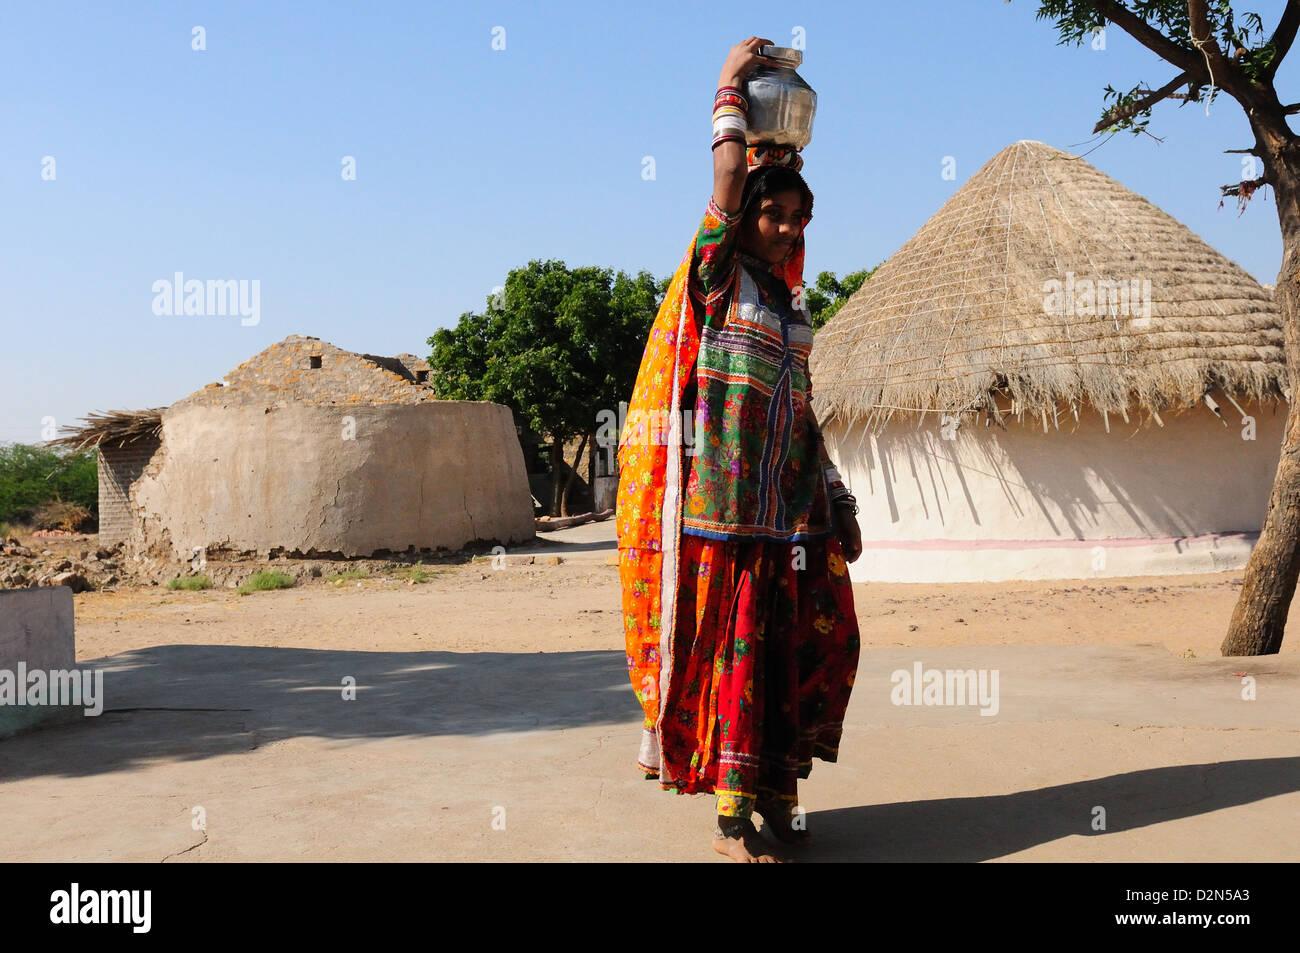 Mir mujer tribal que transportaban el agua en la Olla de acero, Gujarat, India, Asia Foto de stock